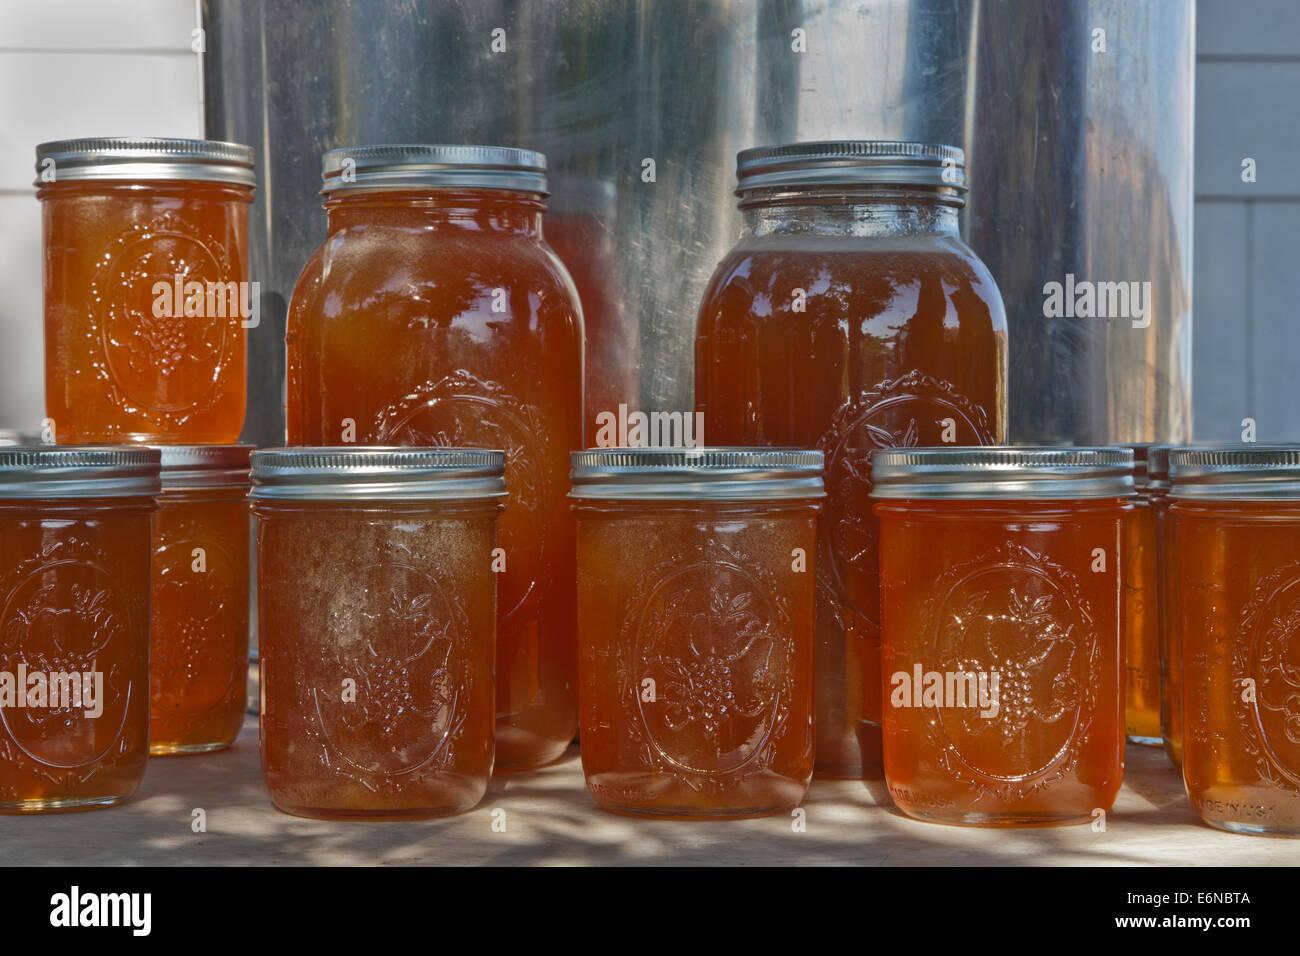 Honey in pint & 2 quart jars. - Stock Image